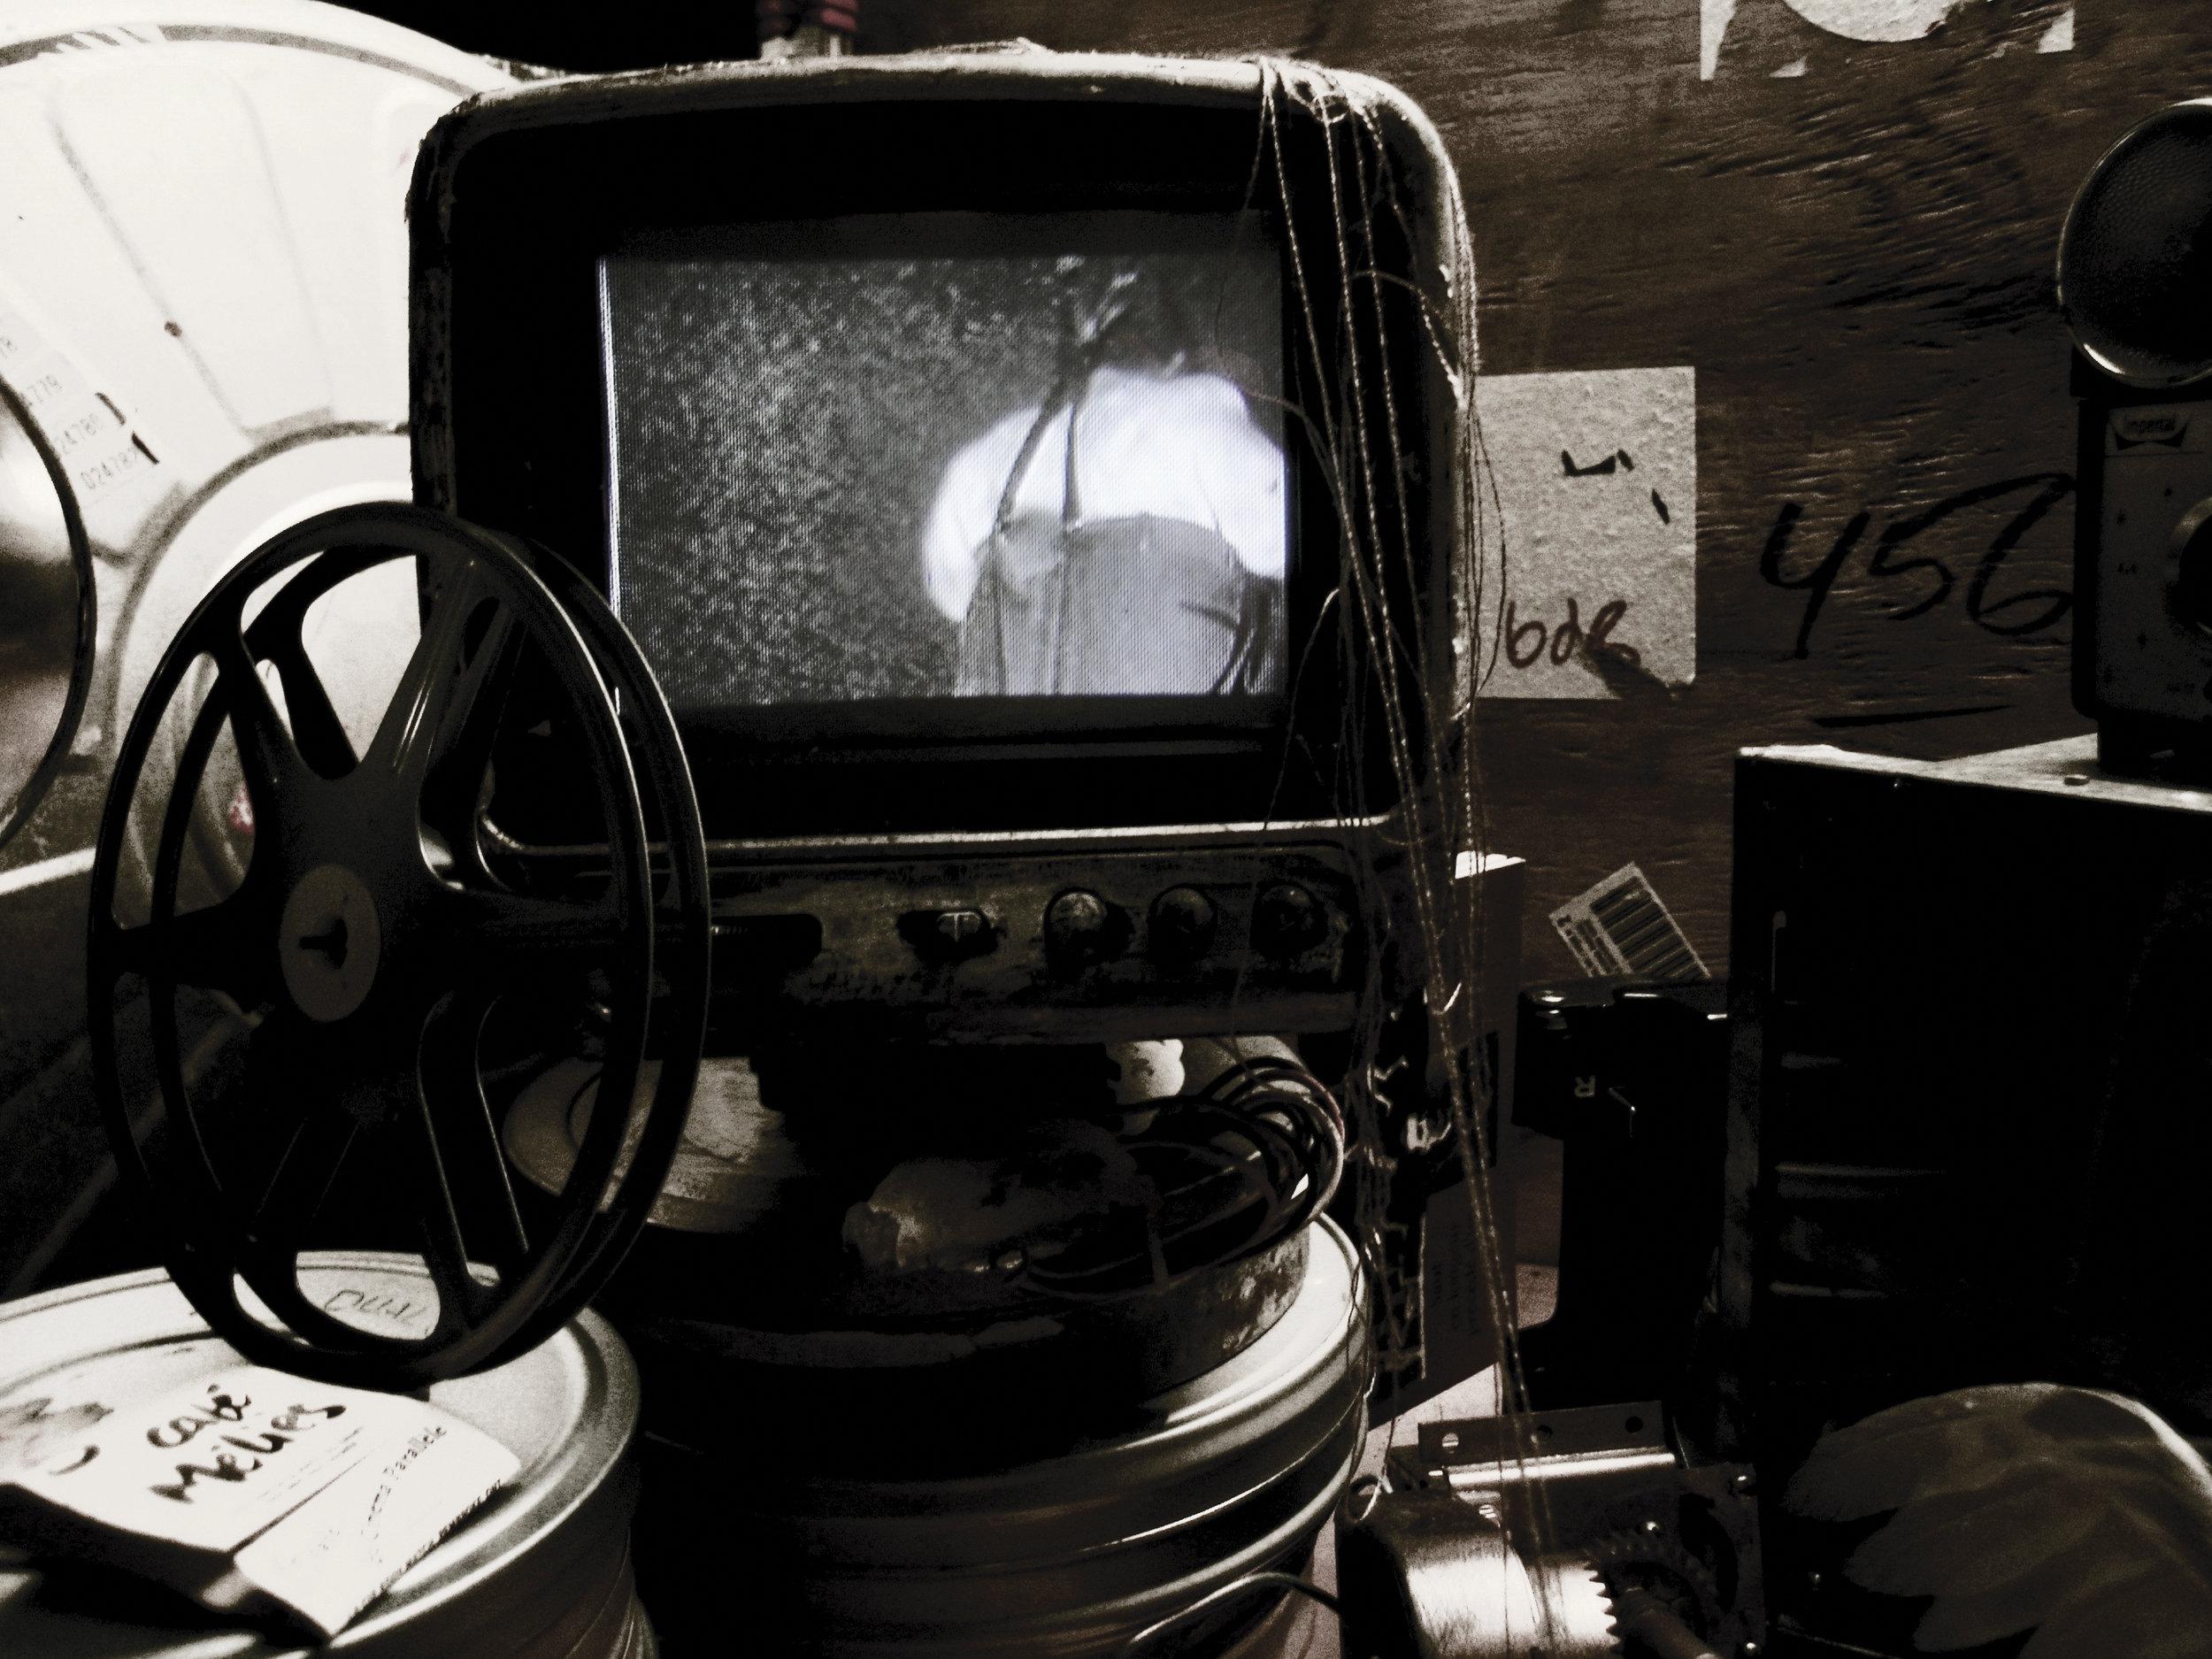 filmosr-5.jpg